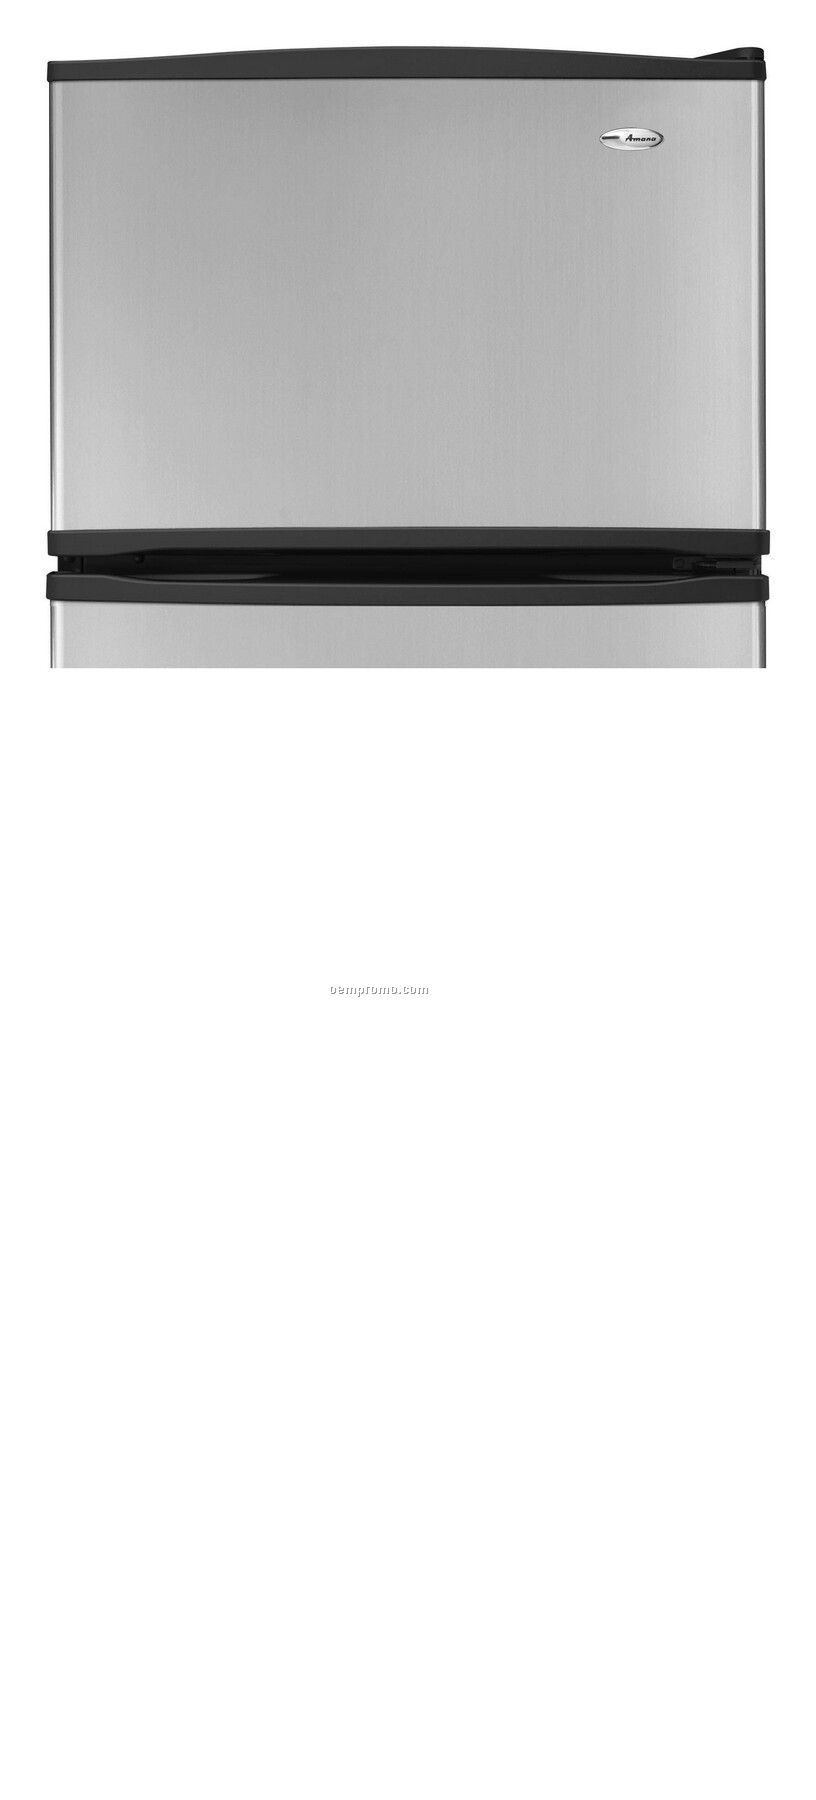 Amana refrigerator deli drawerana a8rxngfbs 17 6 cu ft top amana 17 3 5 cubic foot top freezer refrigerator publicscrutiny Choice Image